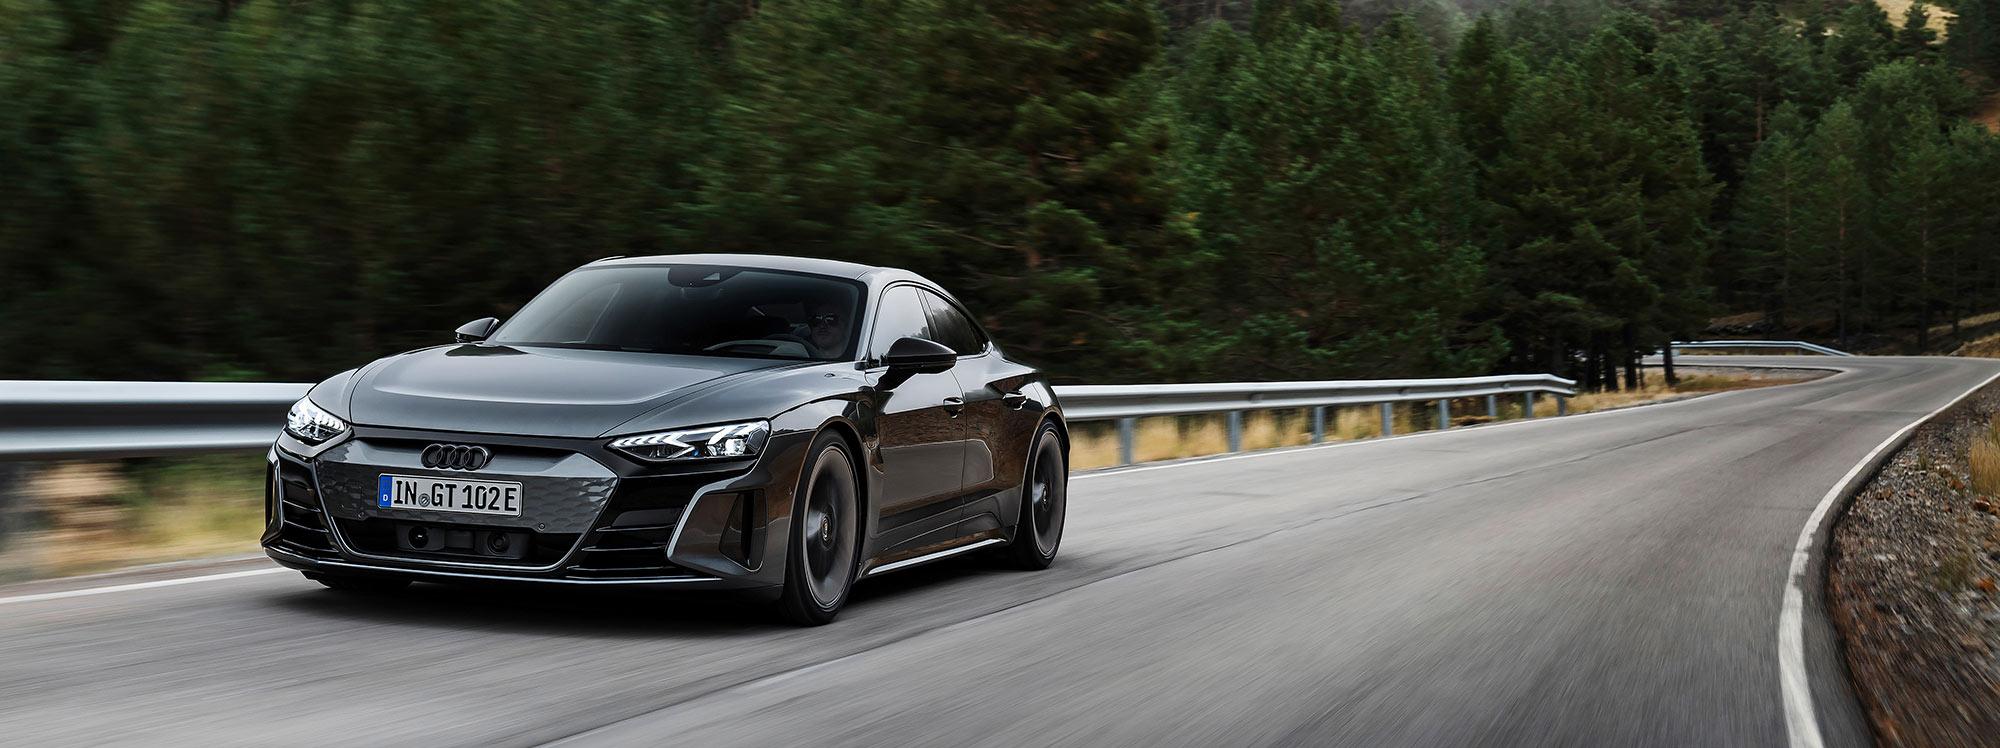 Audi usa agua procedente de lluvia en sus procesos de fabricación